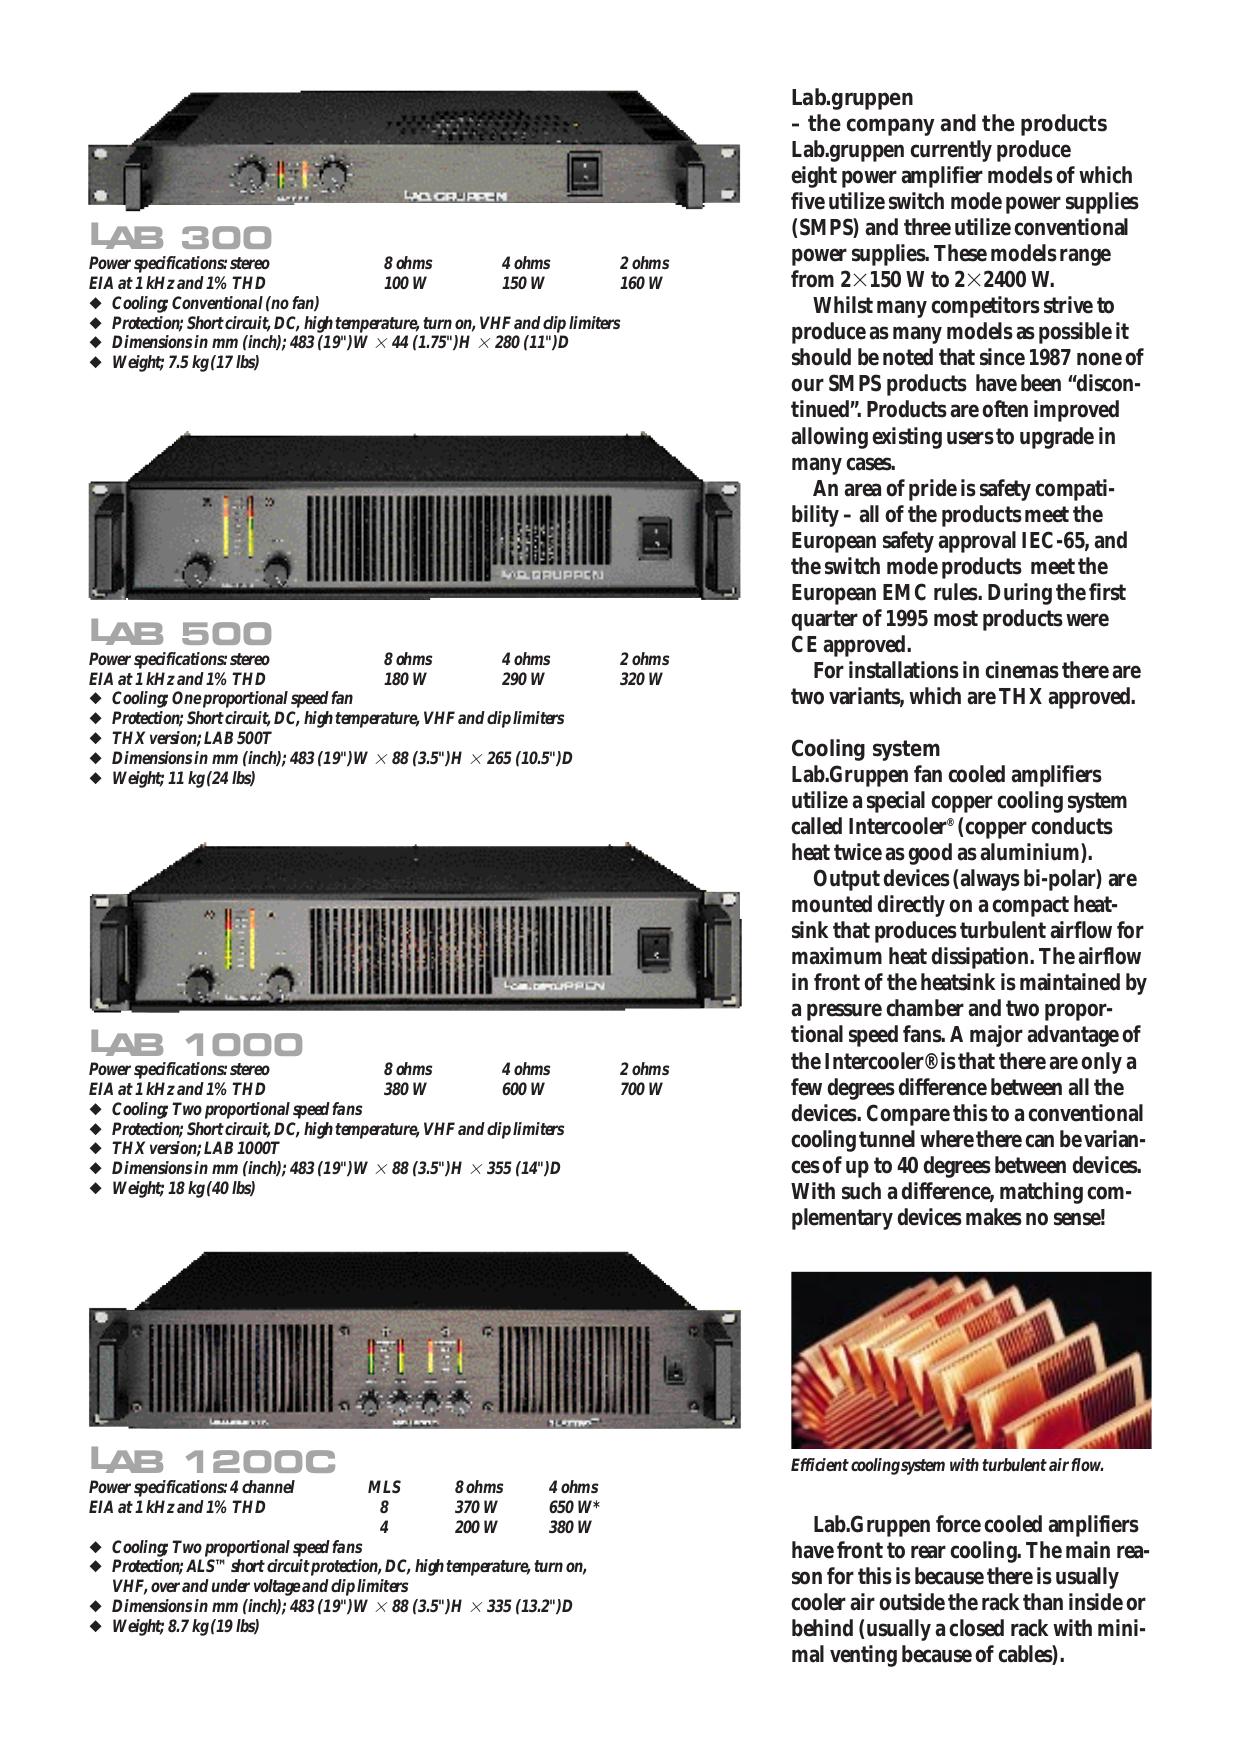 pdf for Lab.gruppen Amp LAB 4000 manual